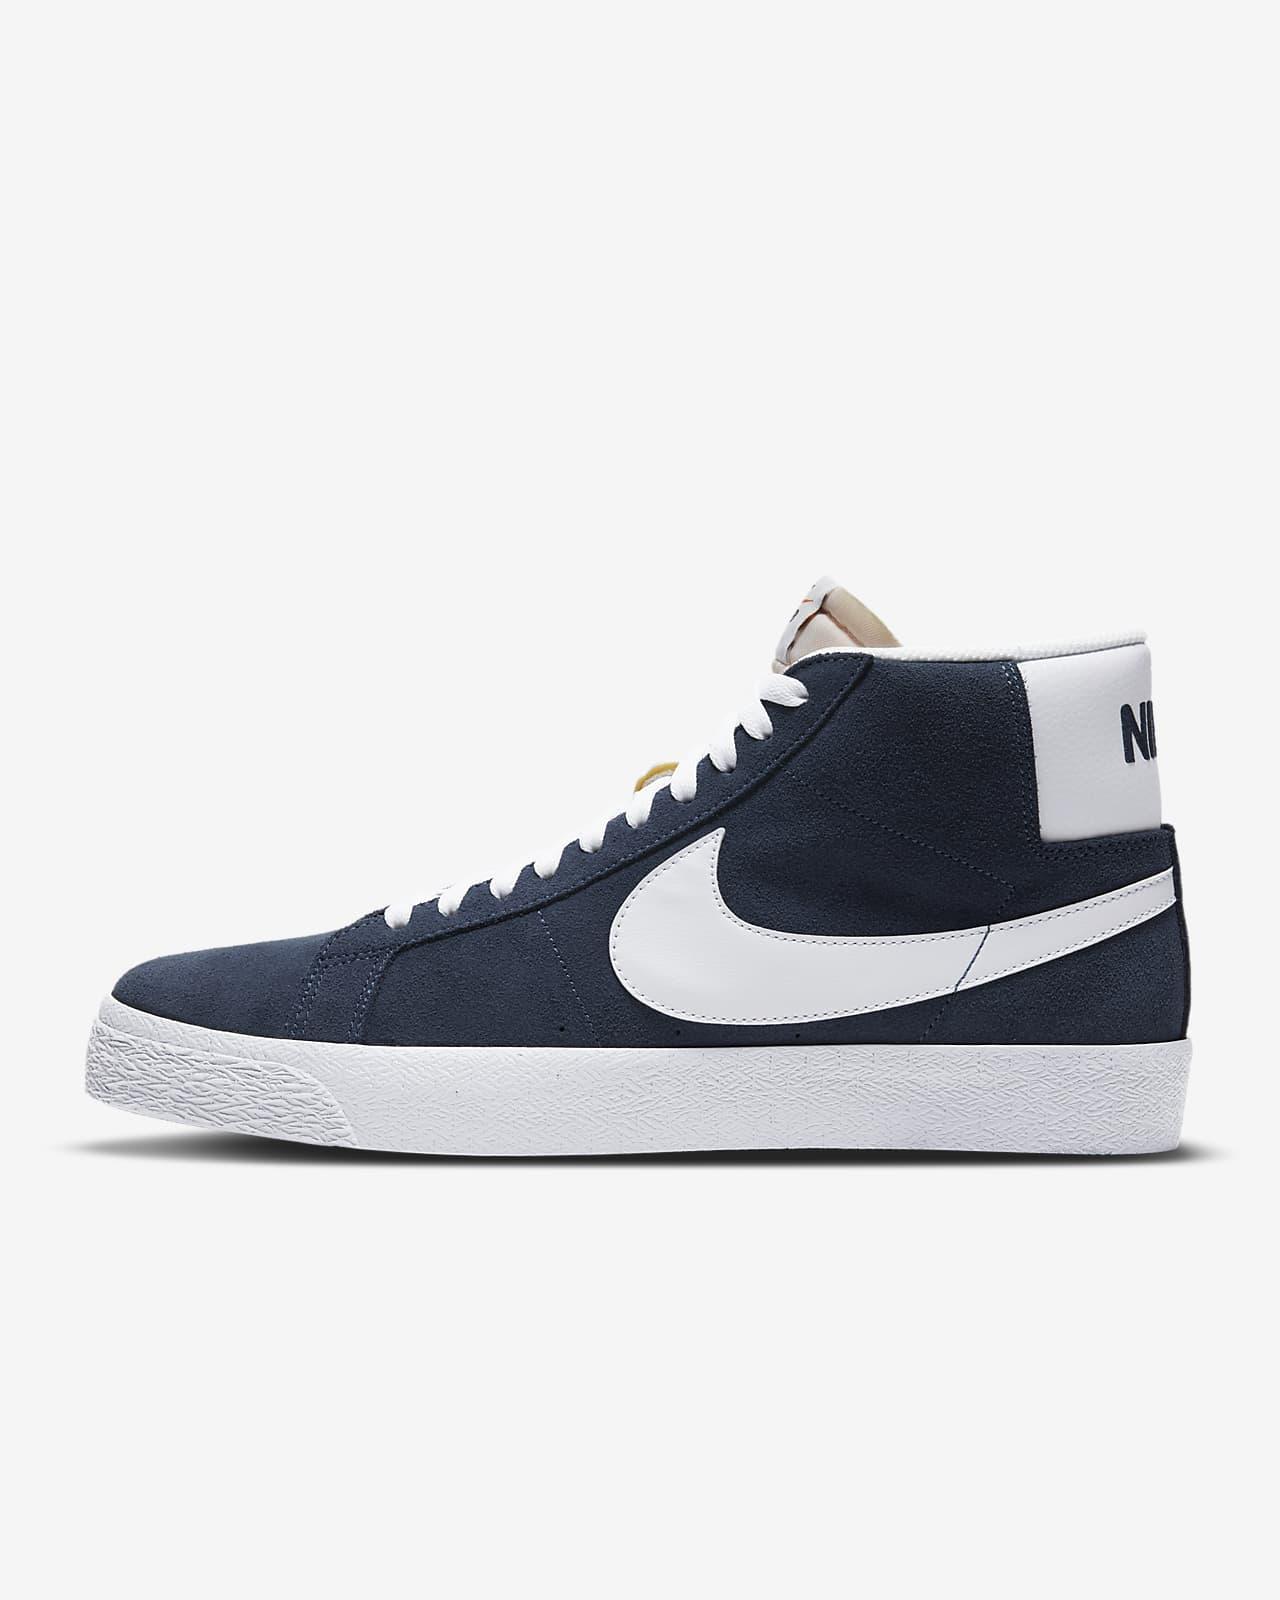 Chaussure de skateboard Nike SB Zoom Blazer Mid